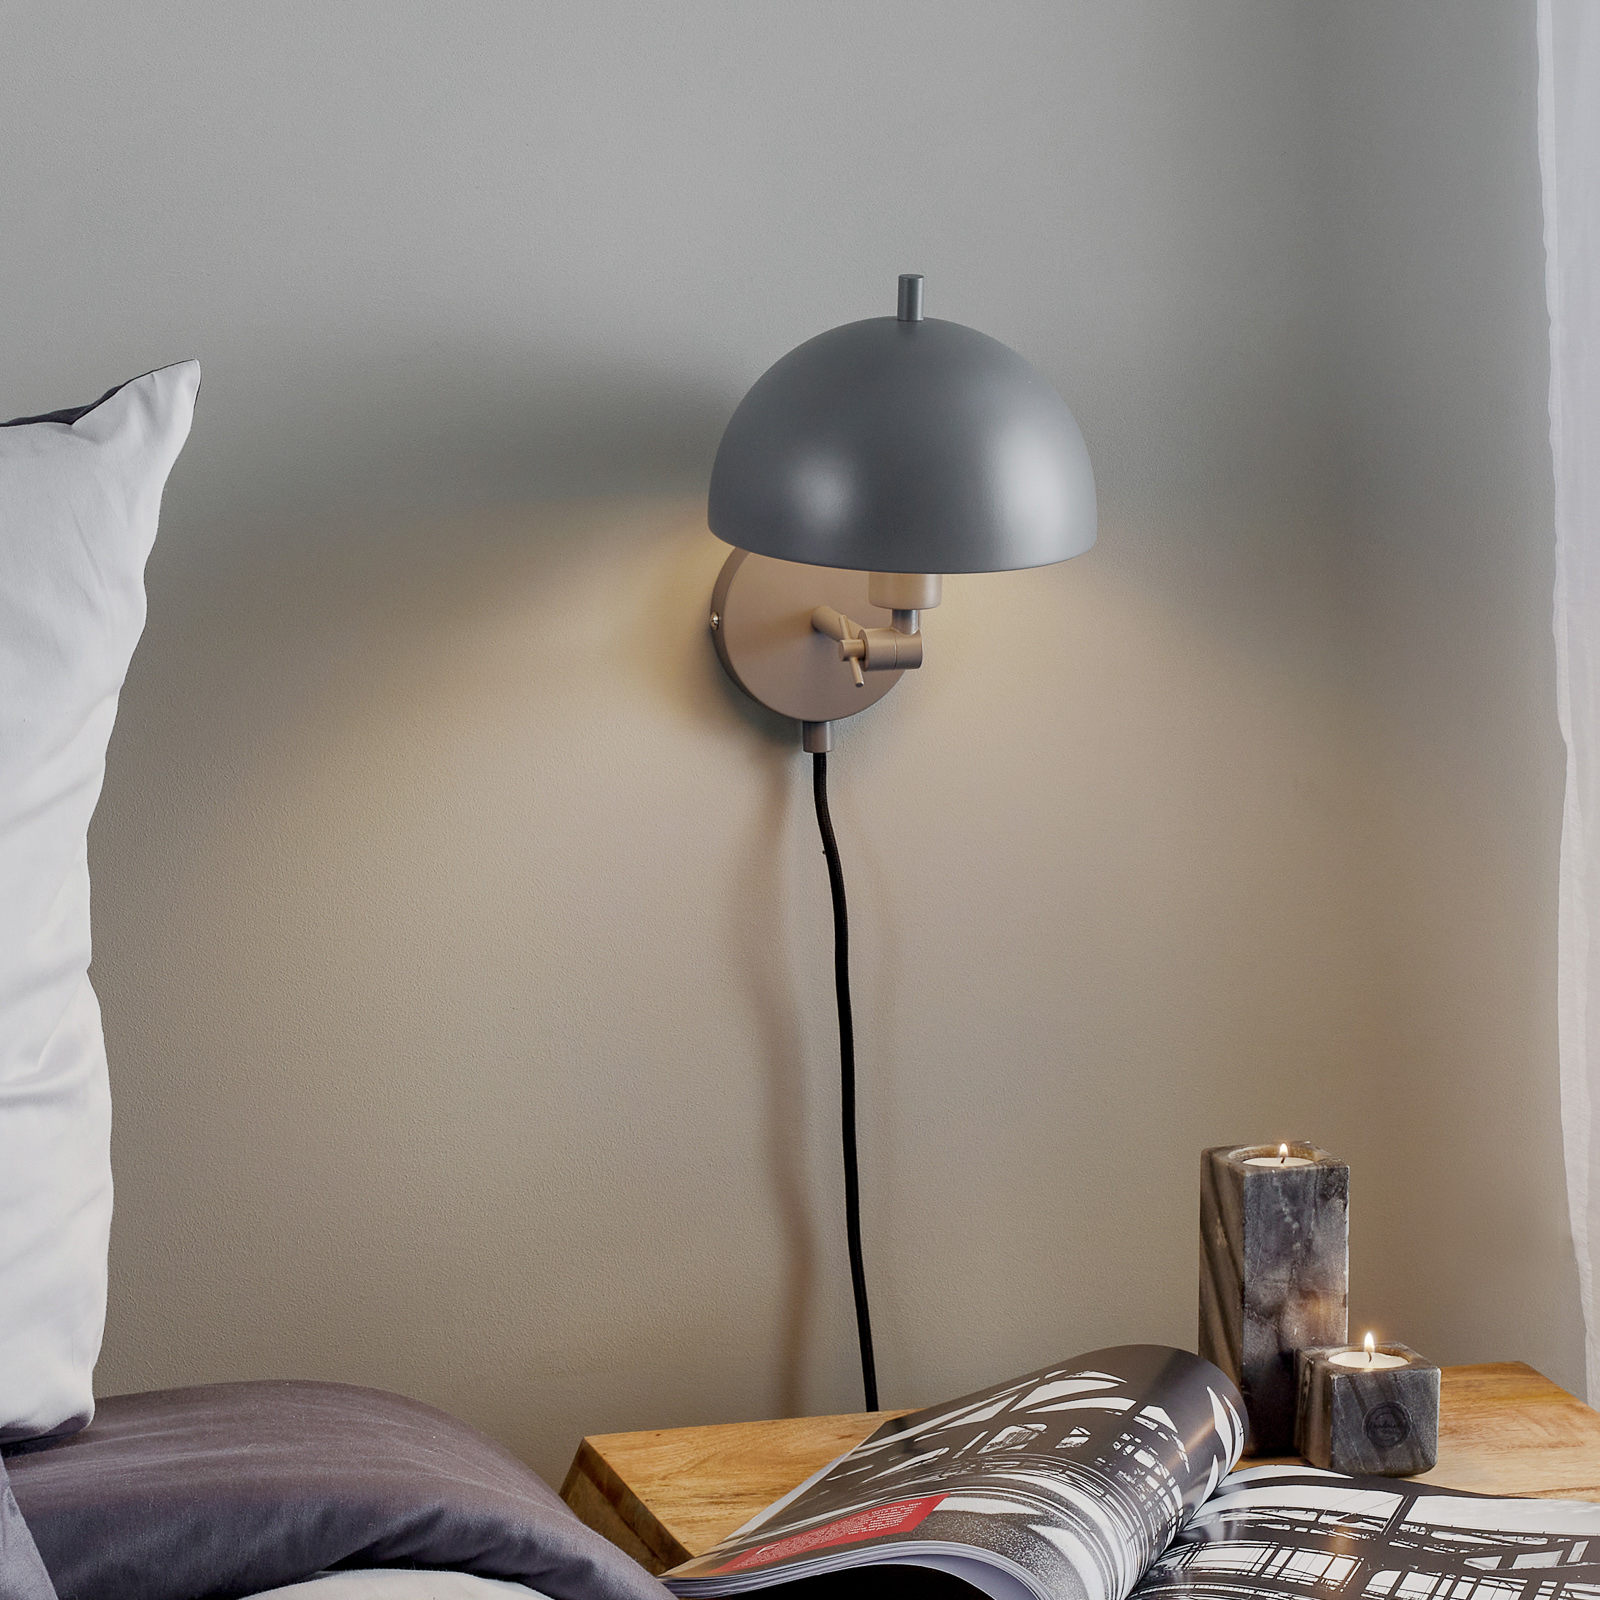 Mooier wonen Kia wandlamp grijs, kantelbaar